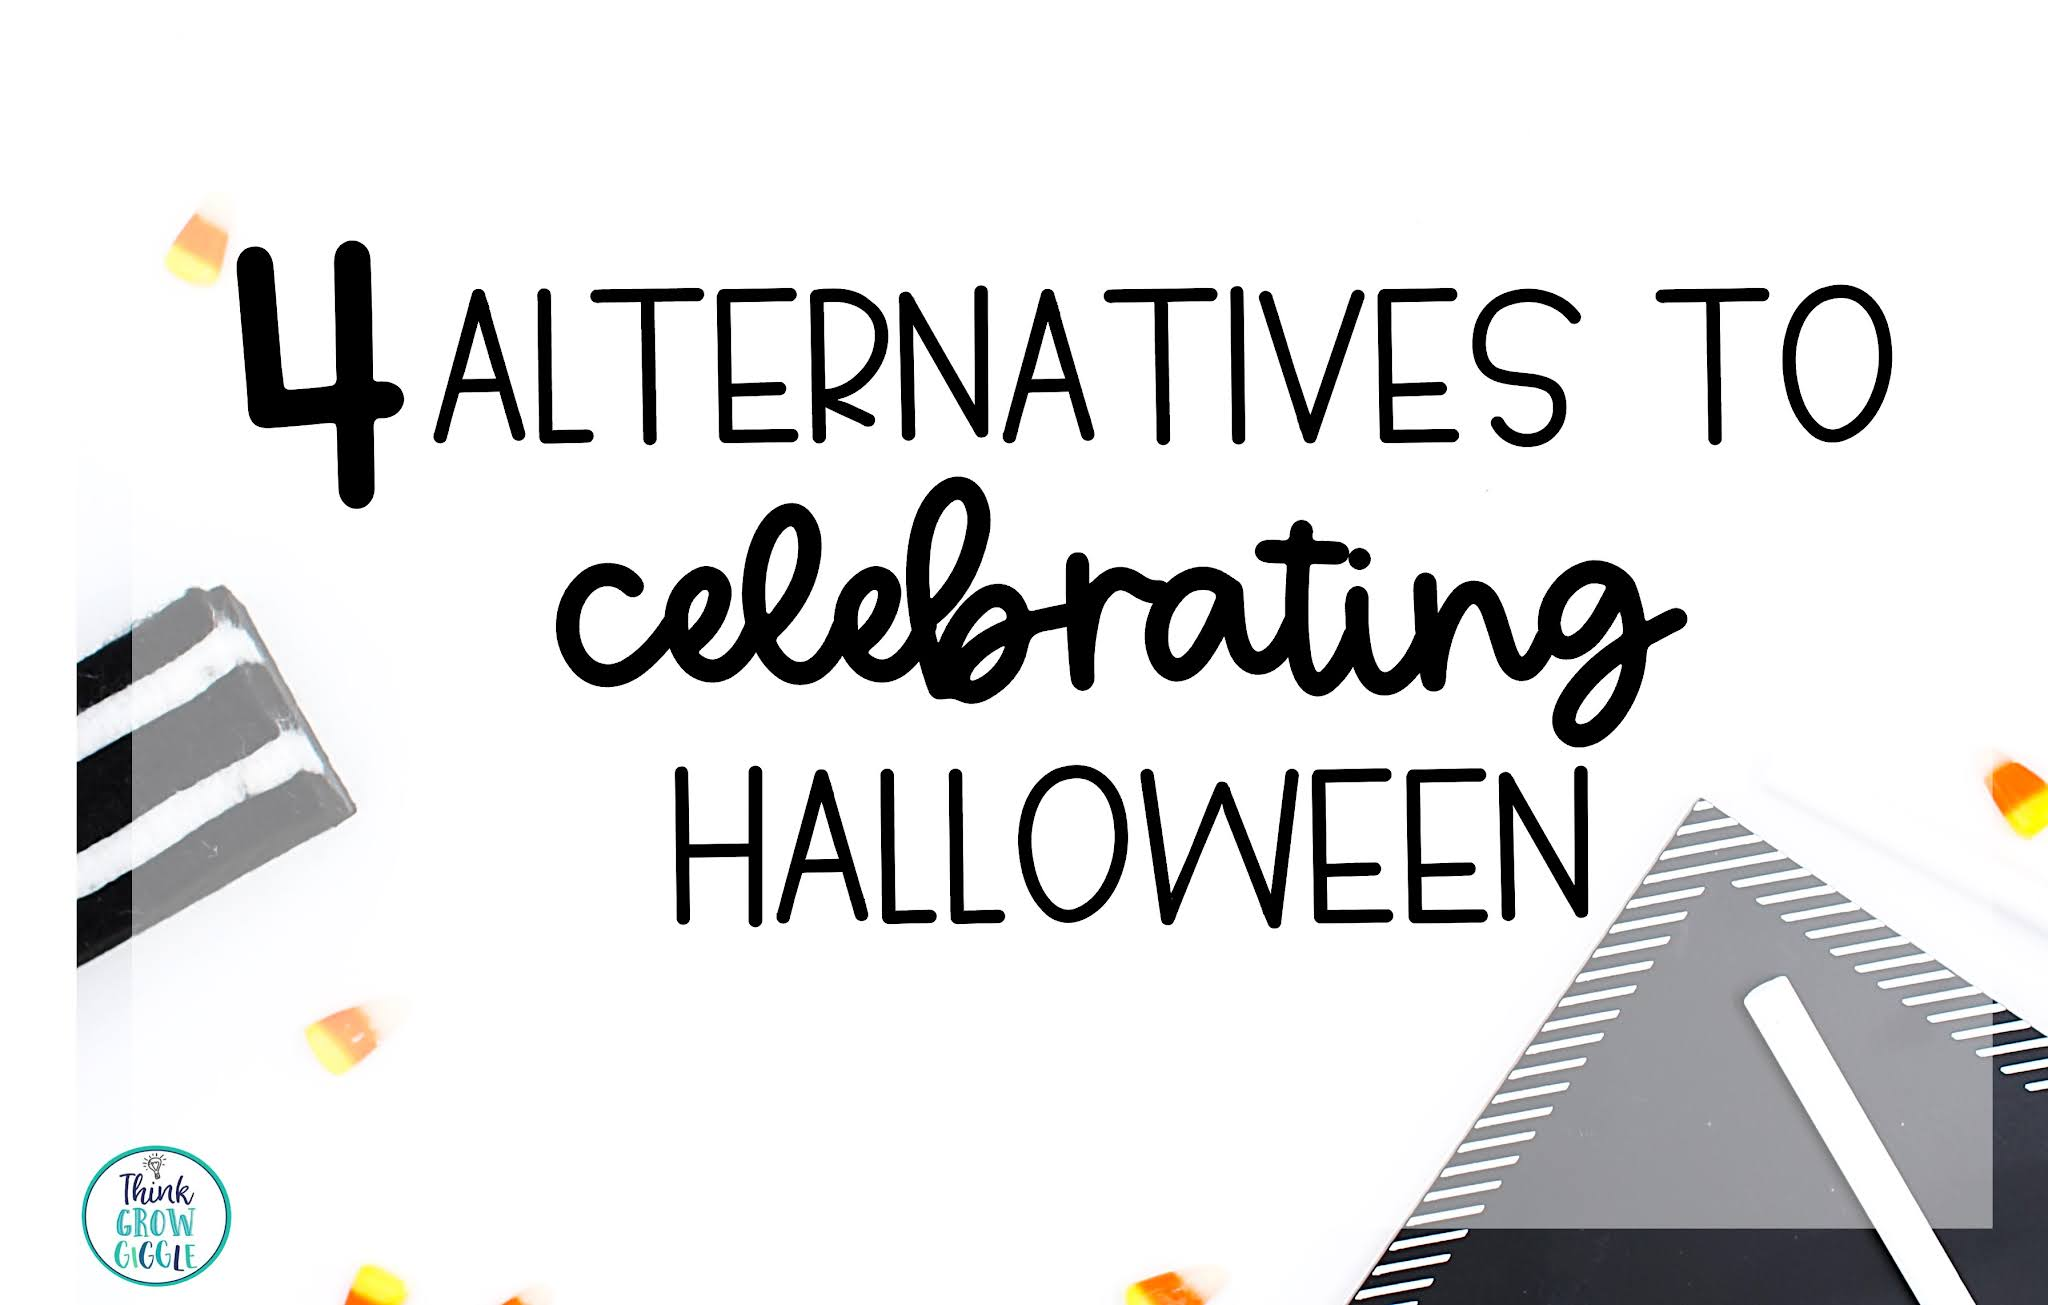 4 Classroom Alternatives to Celebrating Halloween